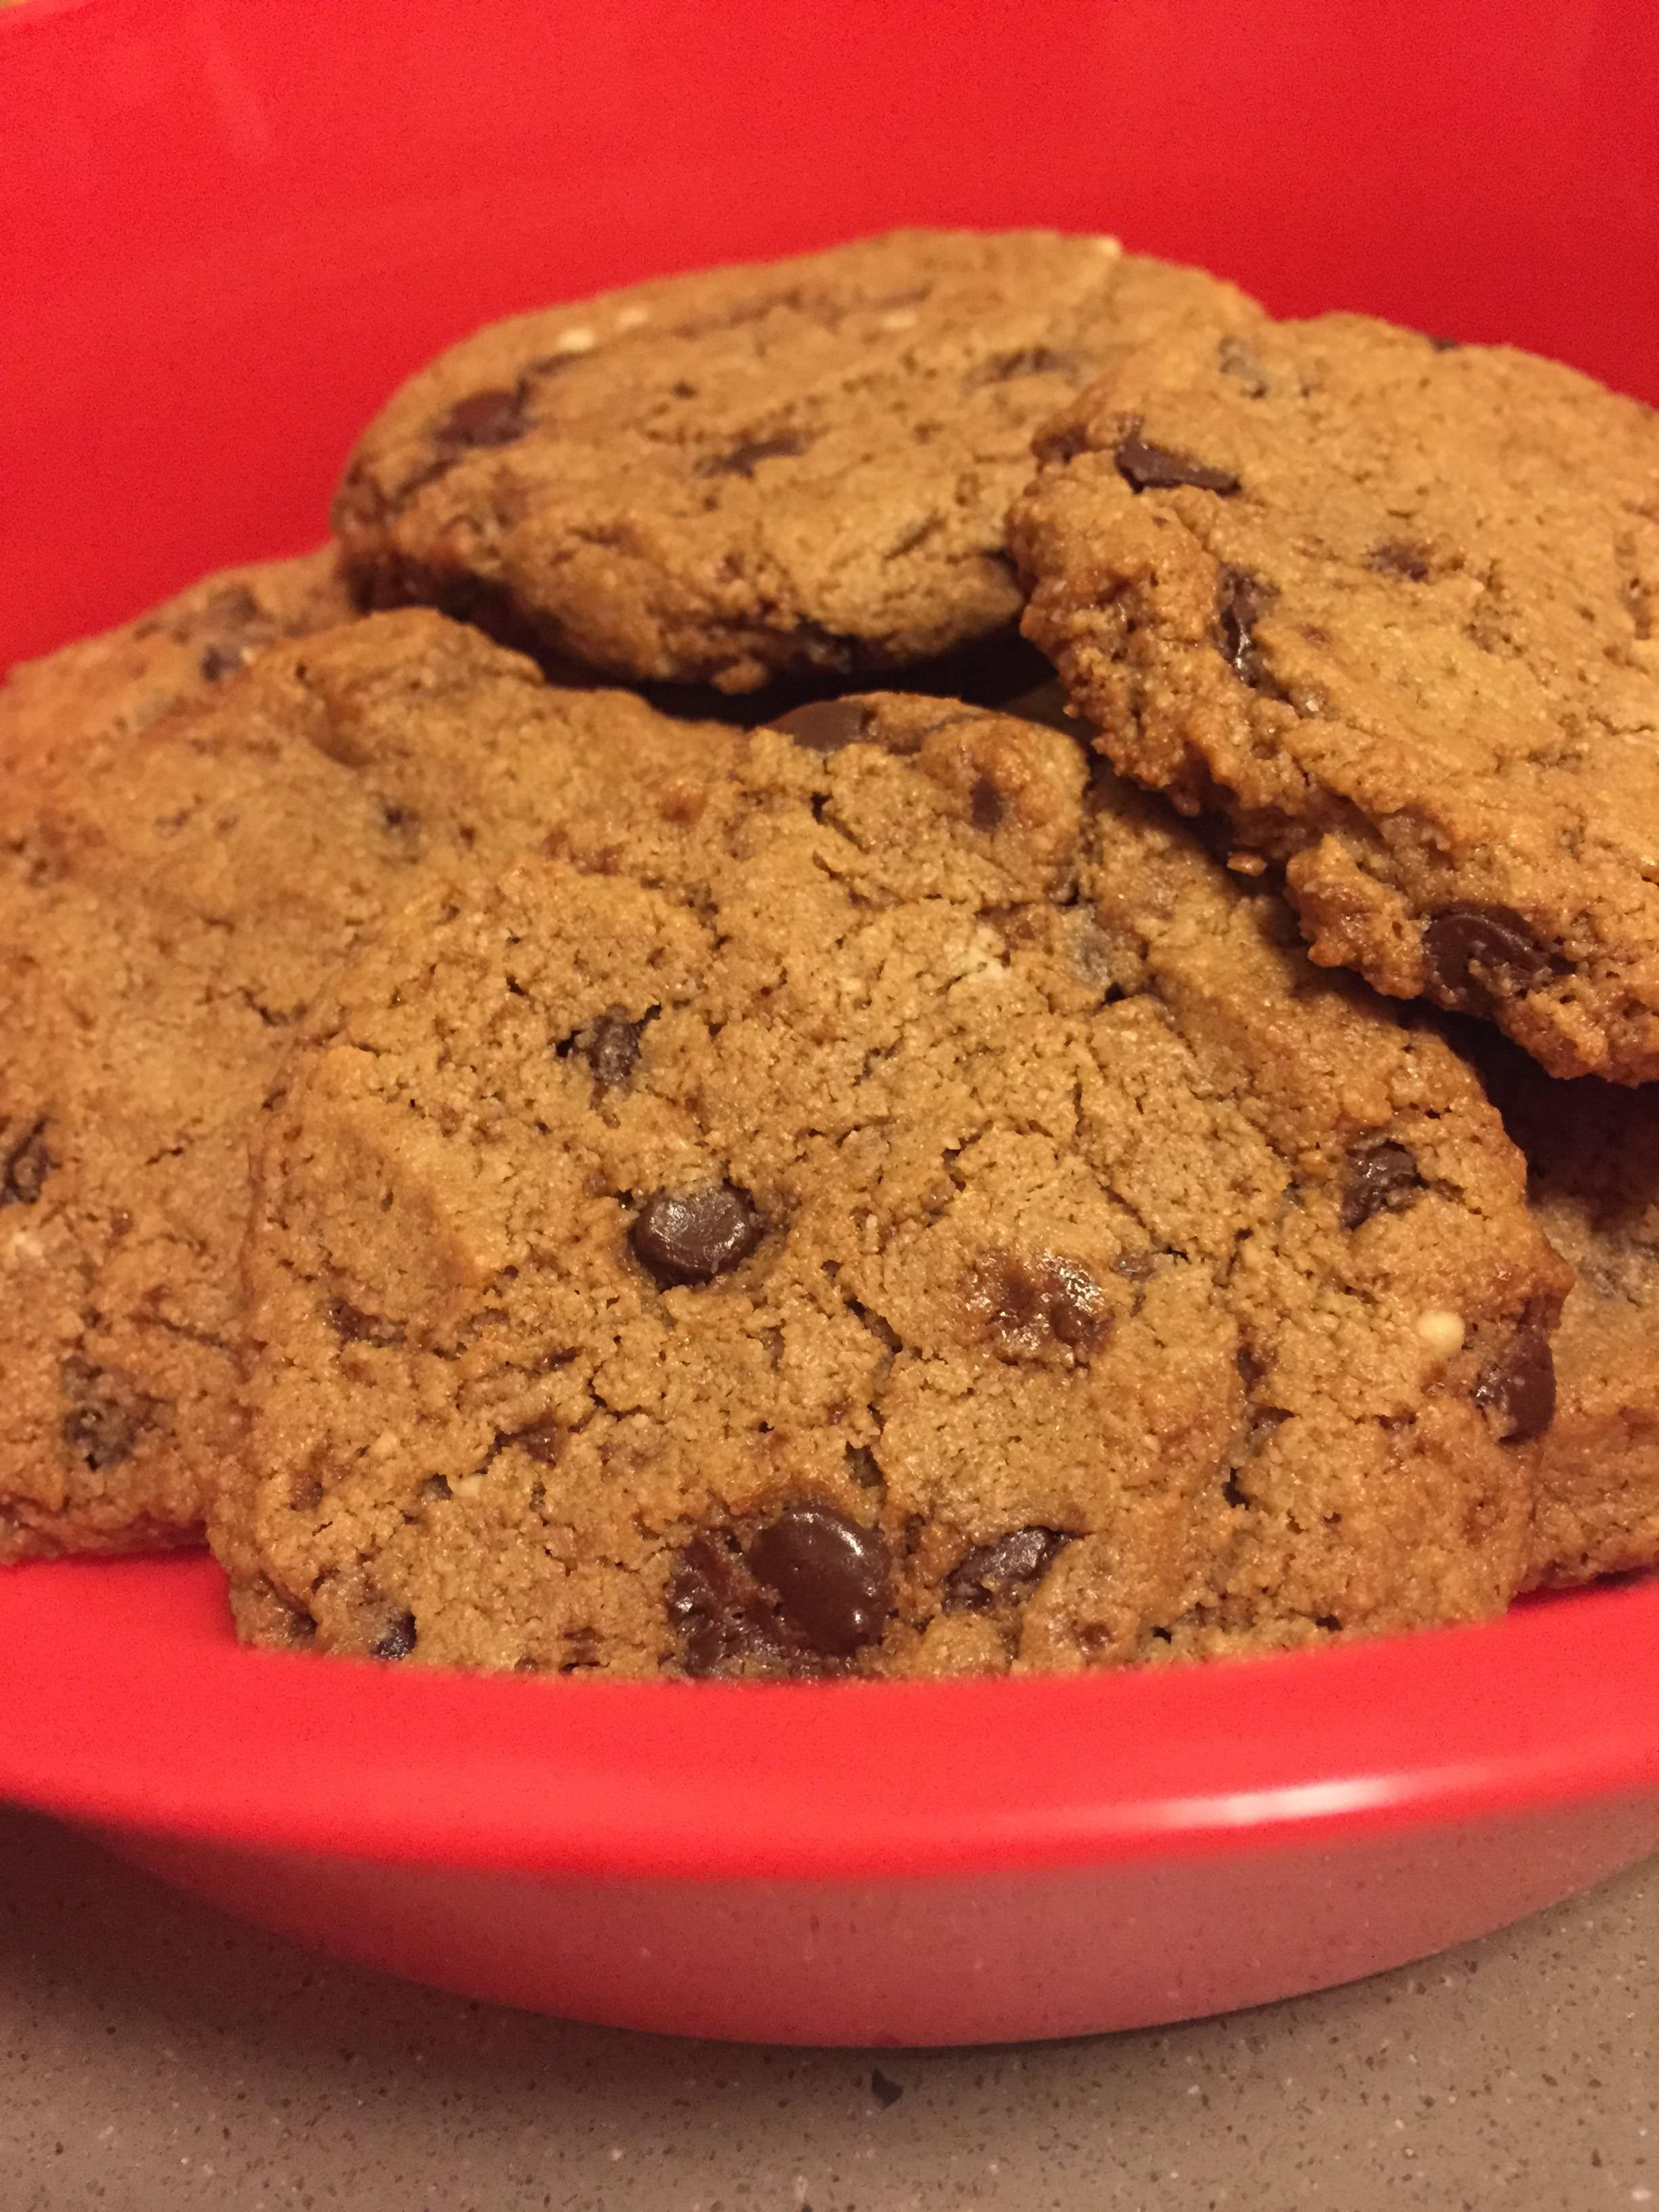 Paleoful Chocolate Chip Cookies